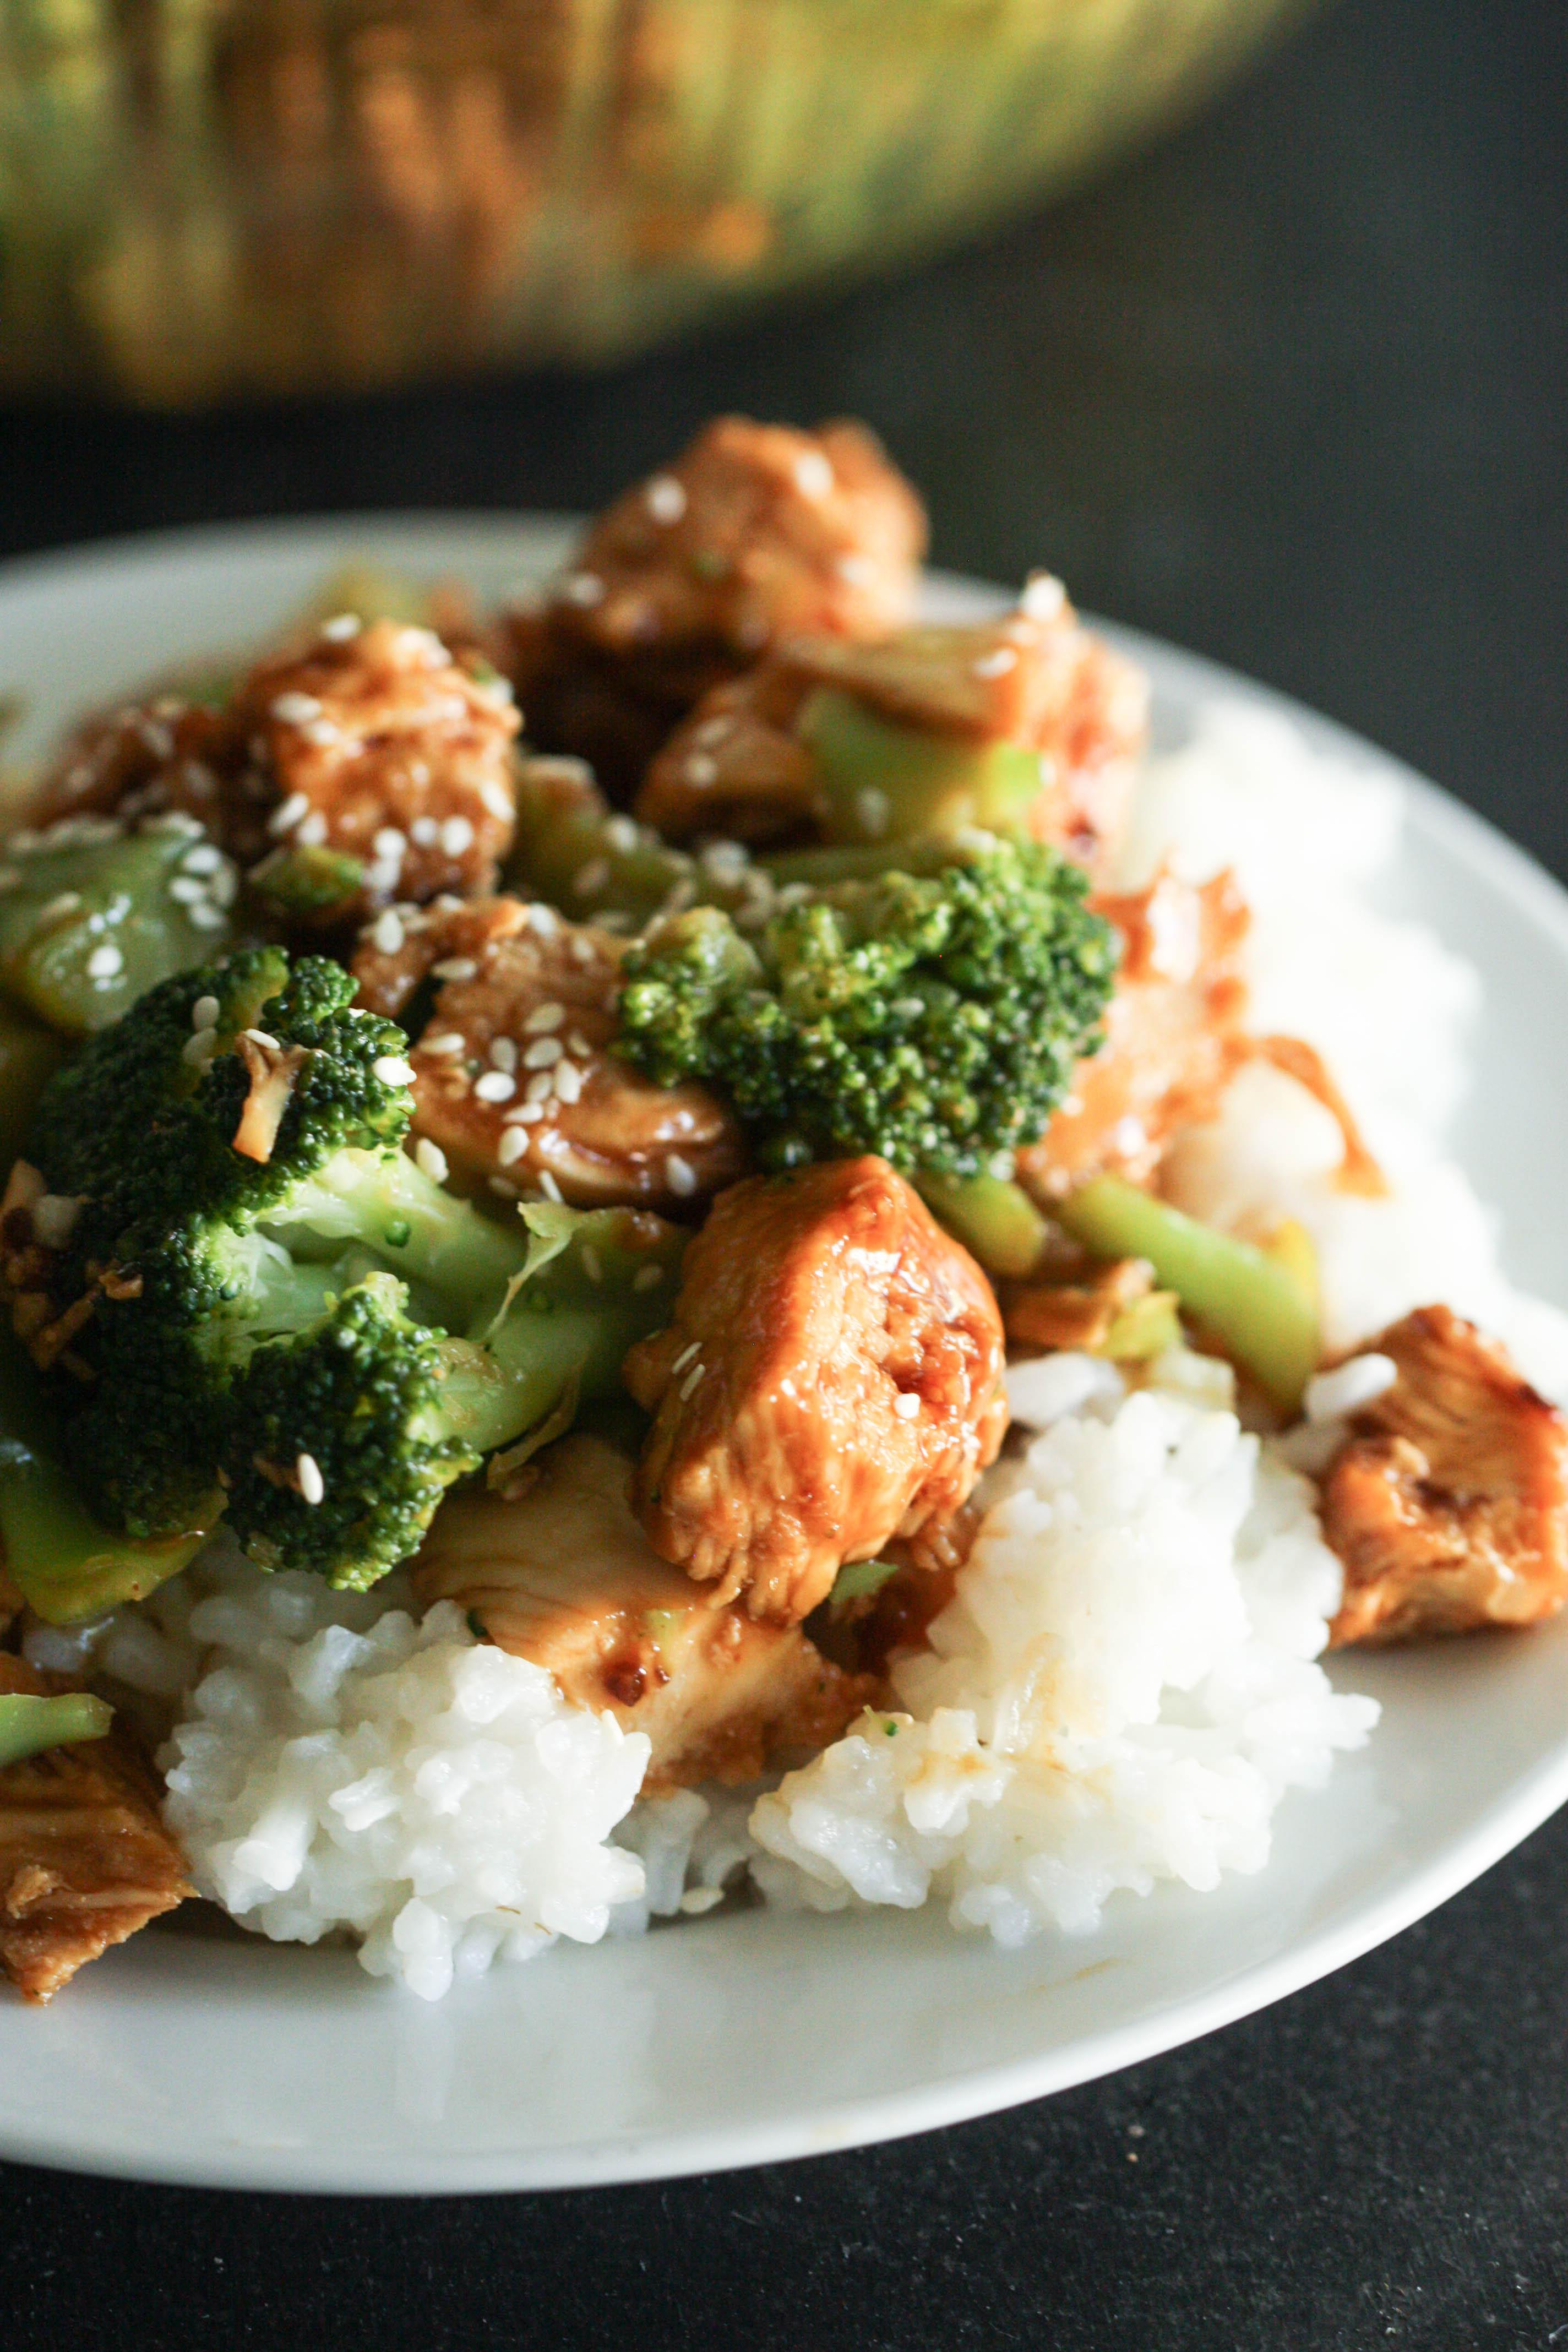 Korean BBQ Chicken and Broccoli